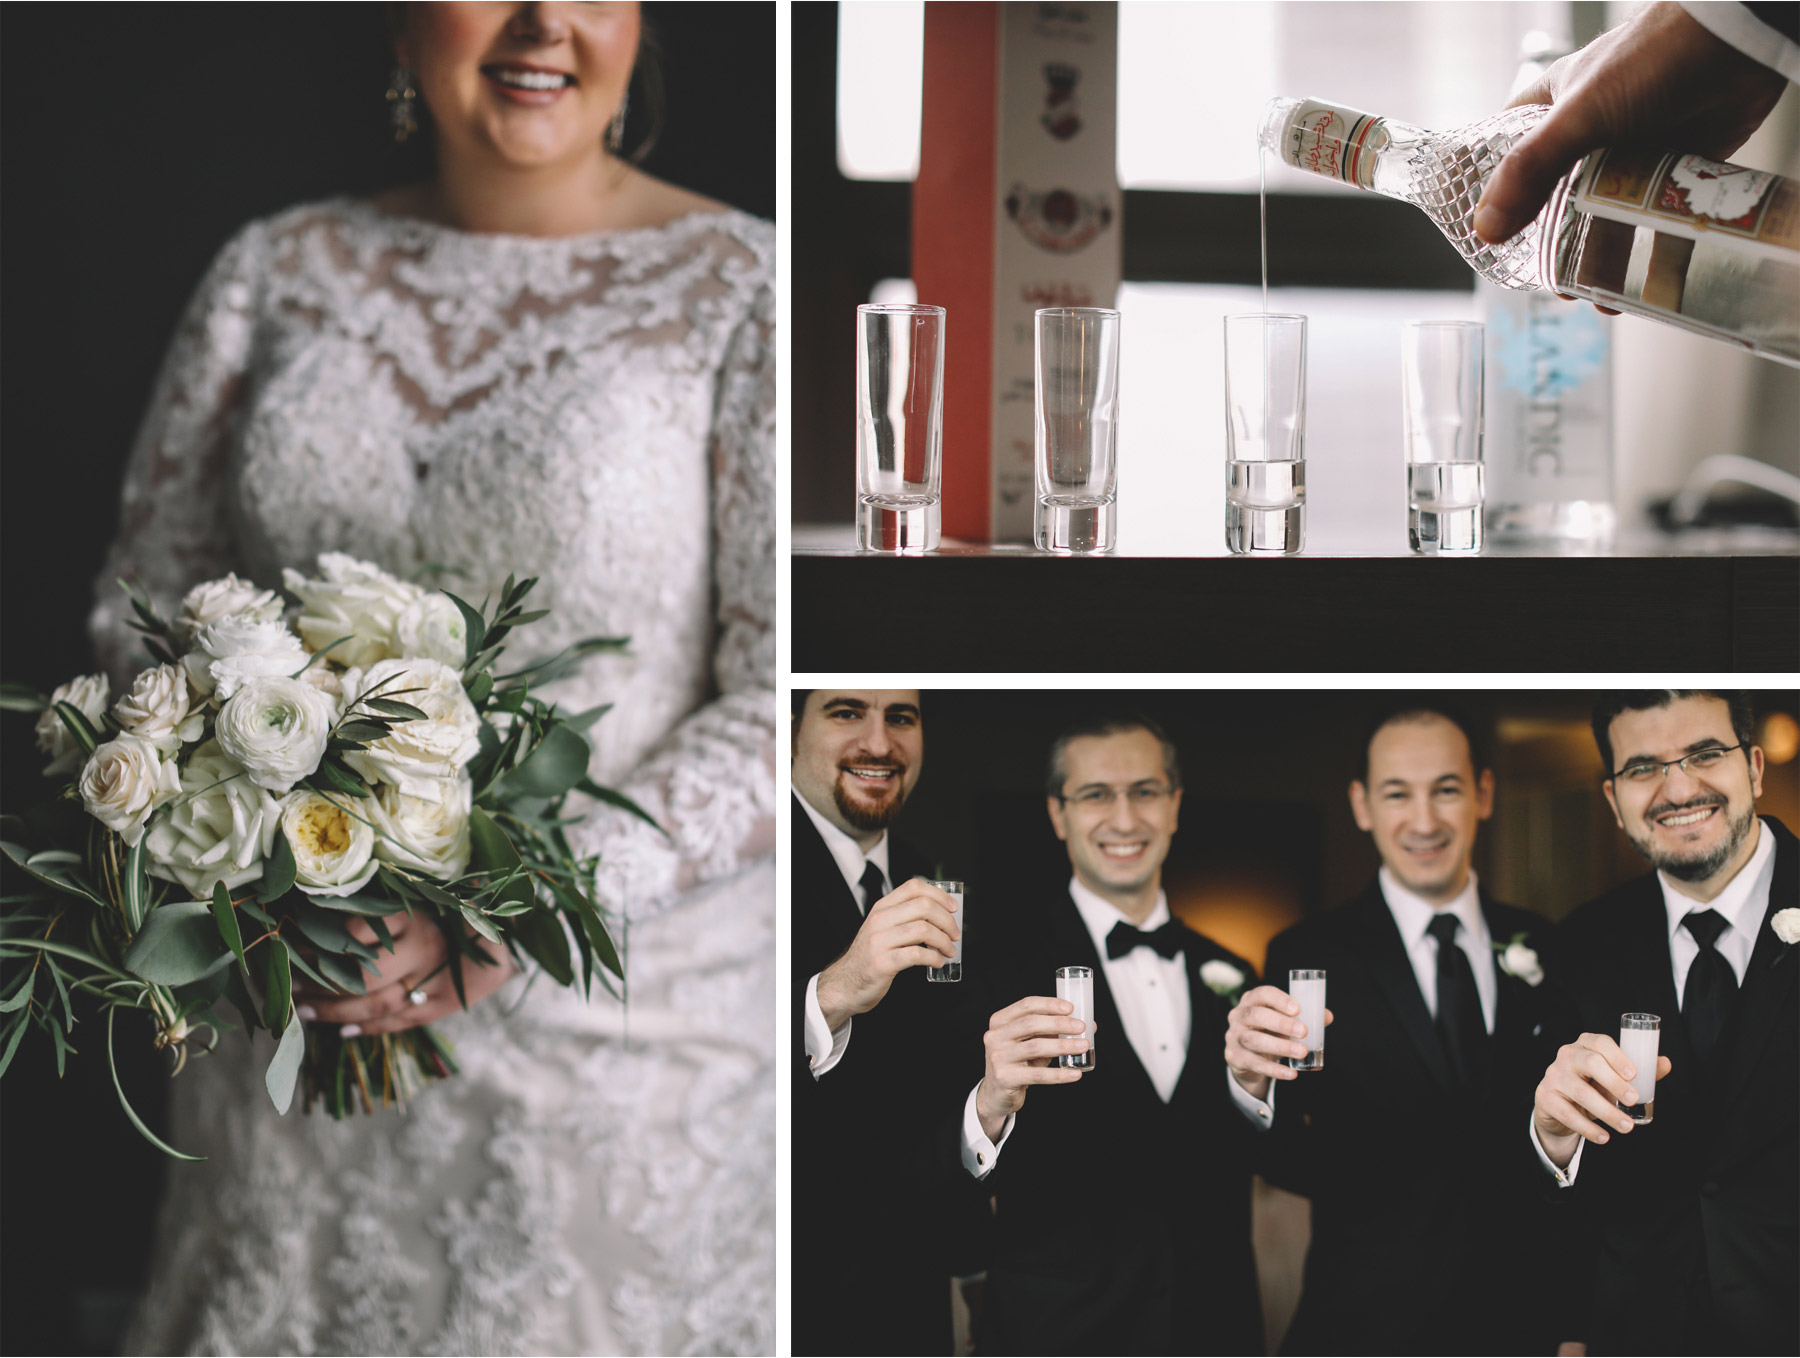 02-Minneapolis-Minnesota-Wedding-Photography-by-Vick-Photography-Toast-Flowers-Bride-Groomsmen-Anja-and-Waseem.jpg